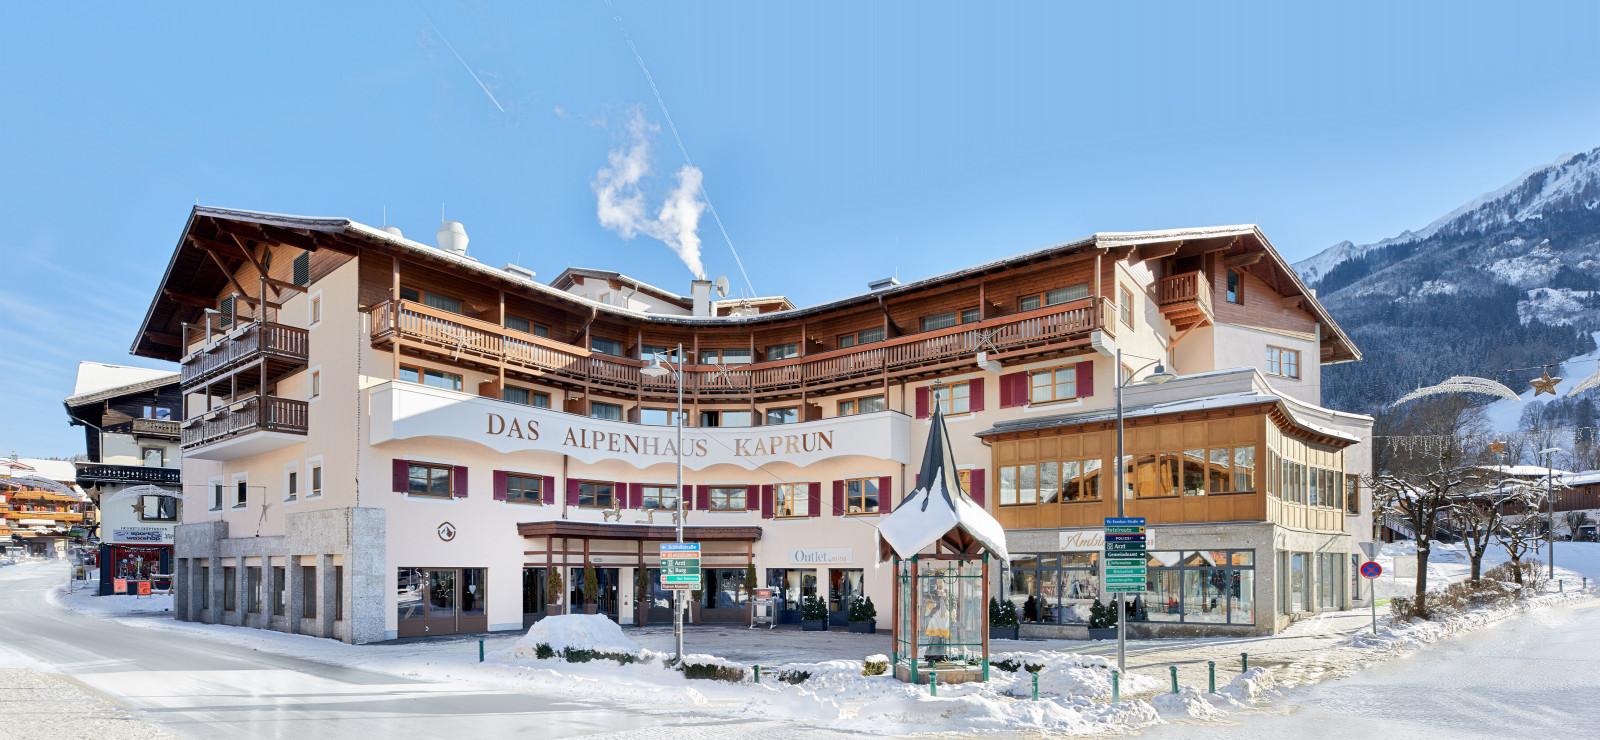 Das Alpenhaus Kaprun Bilder | Bild 1